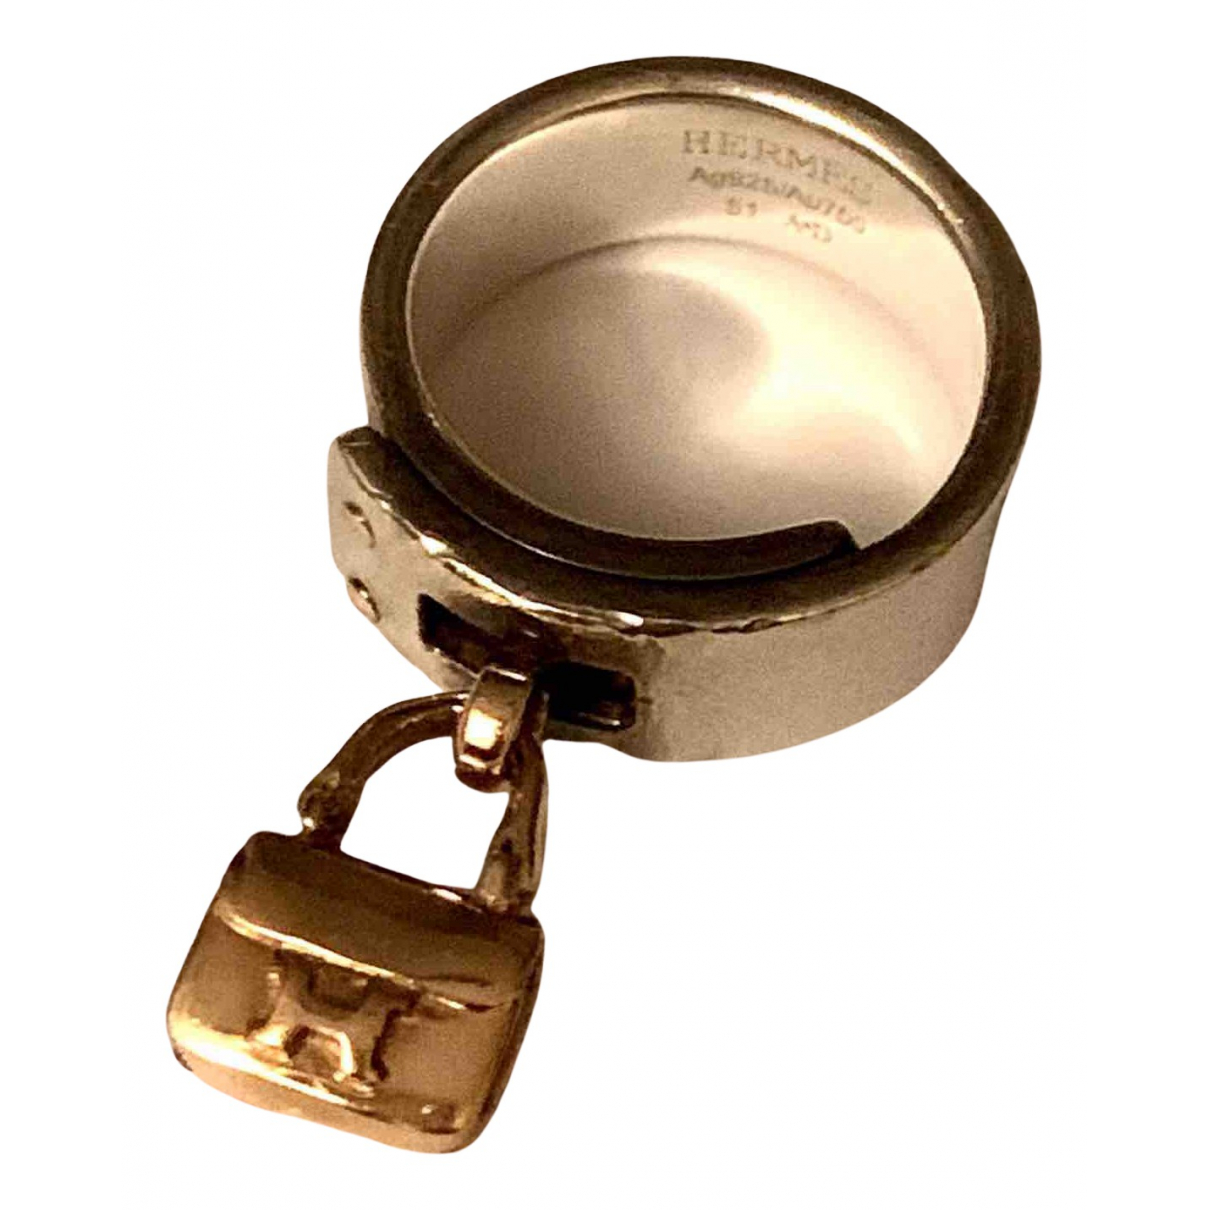 Hermès N Silver Silver ring for Women 51 EU